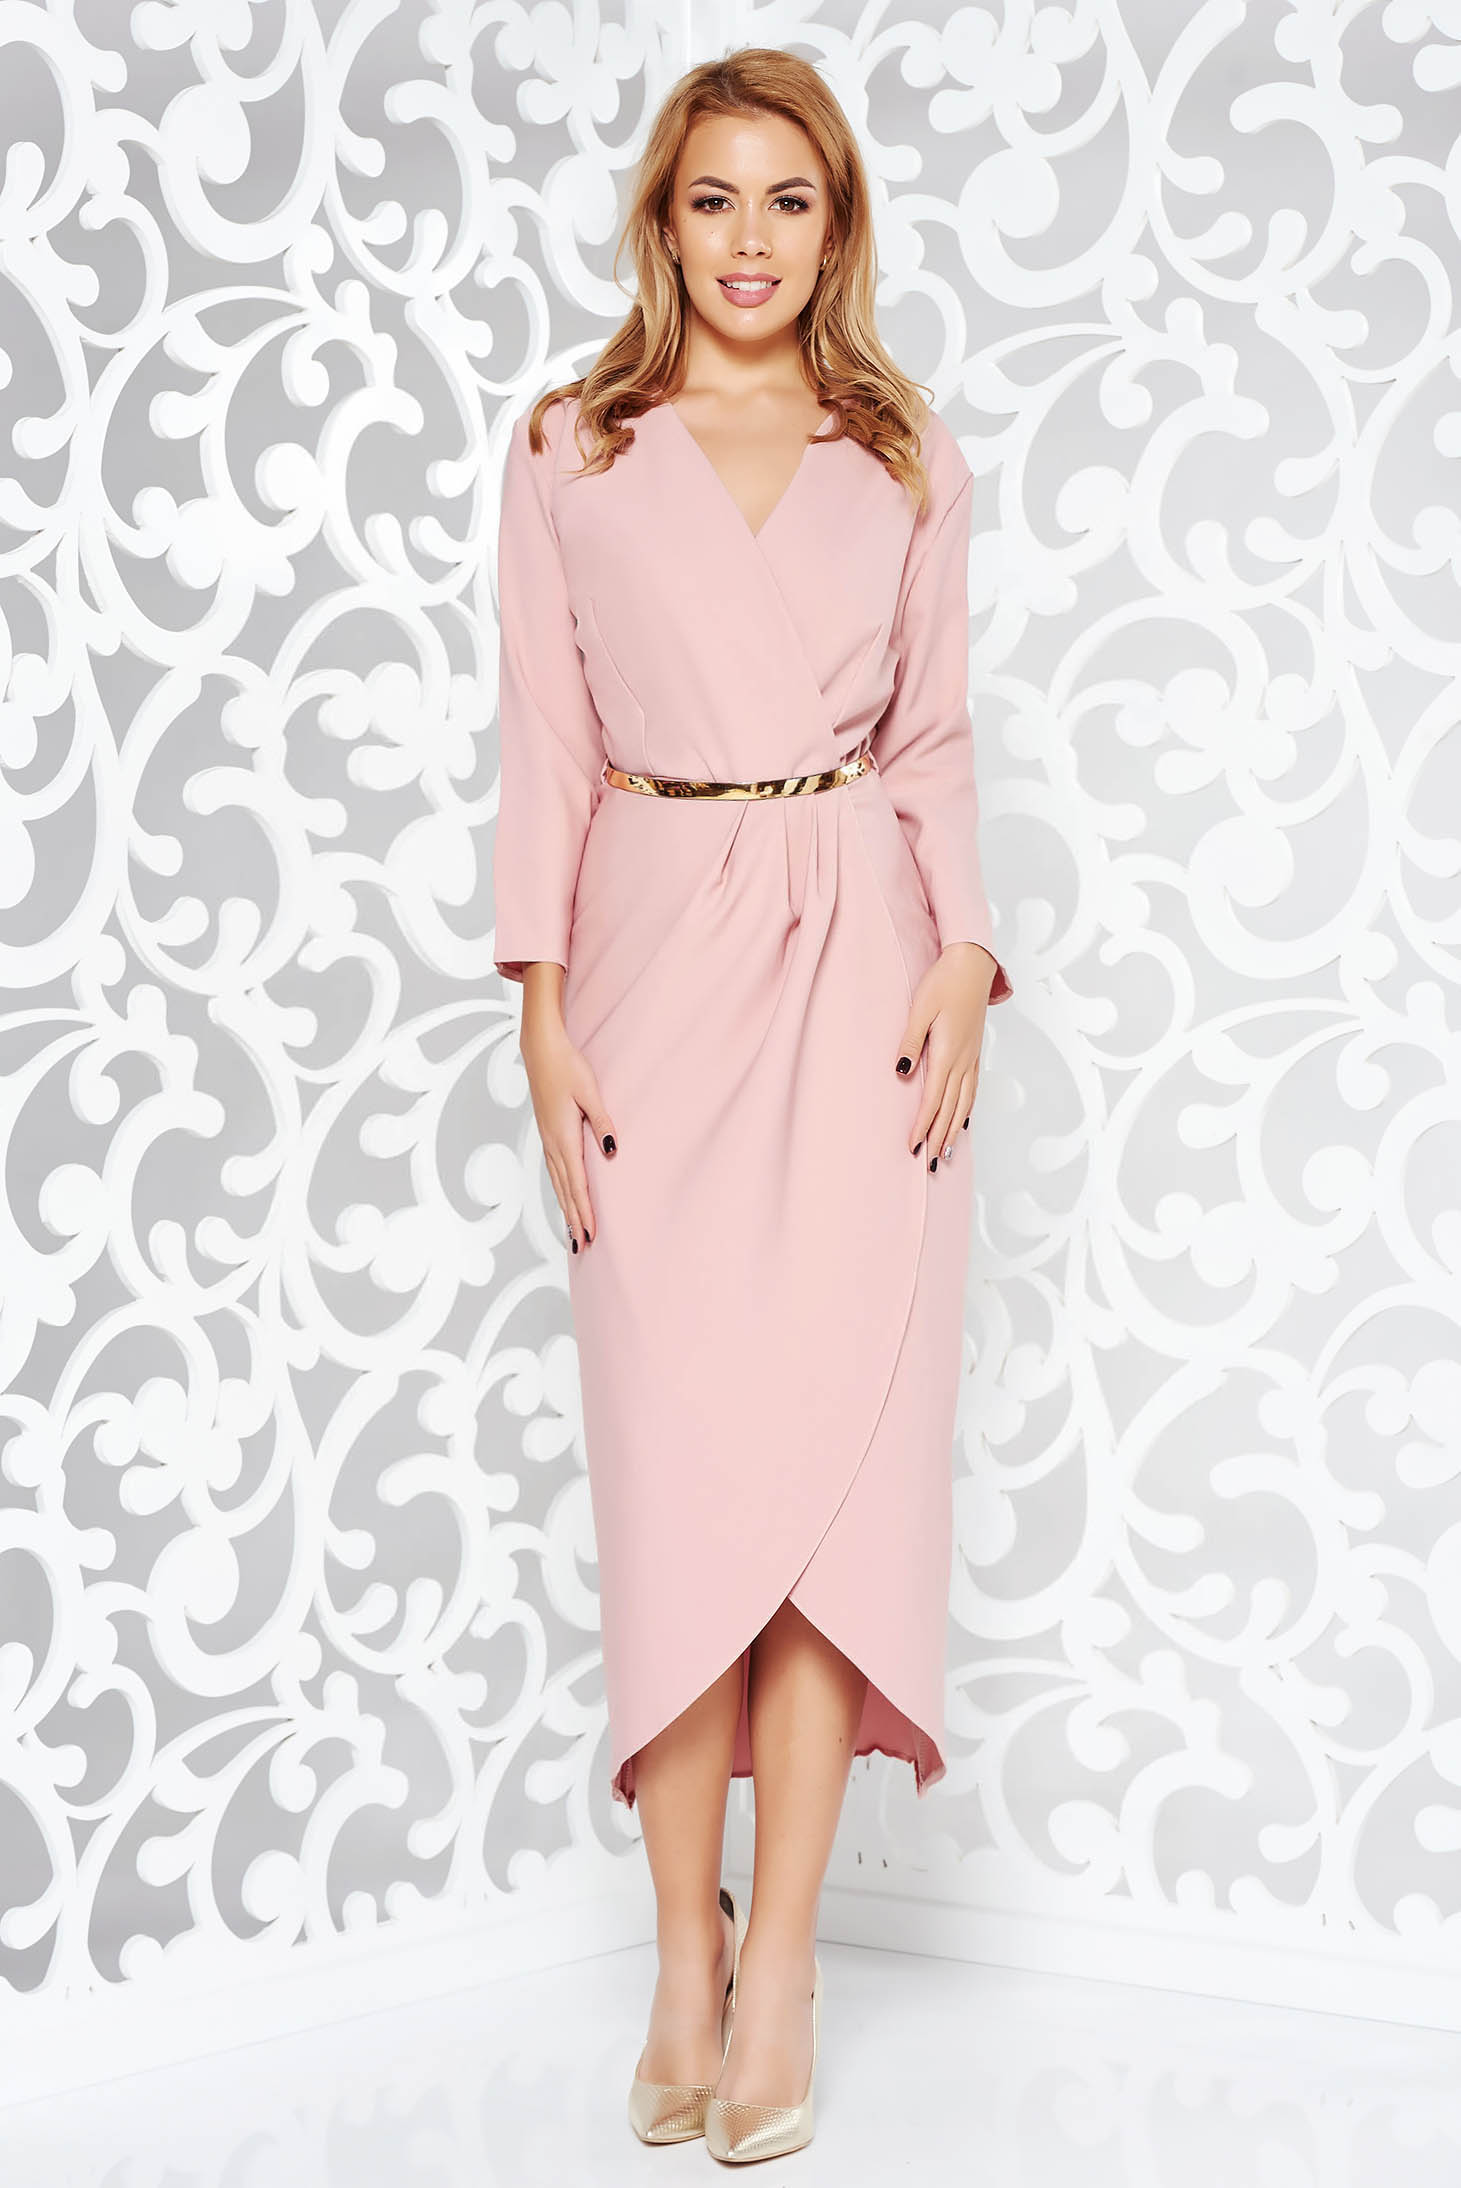 Rochie rosa eleganta din stofa subtire usor elastica captusita pe interior cu accesoriu tip curea